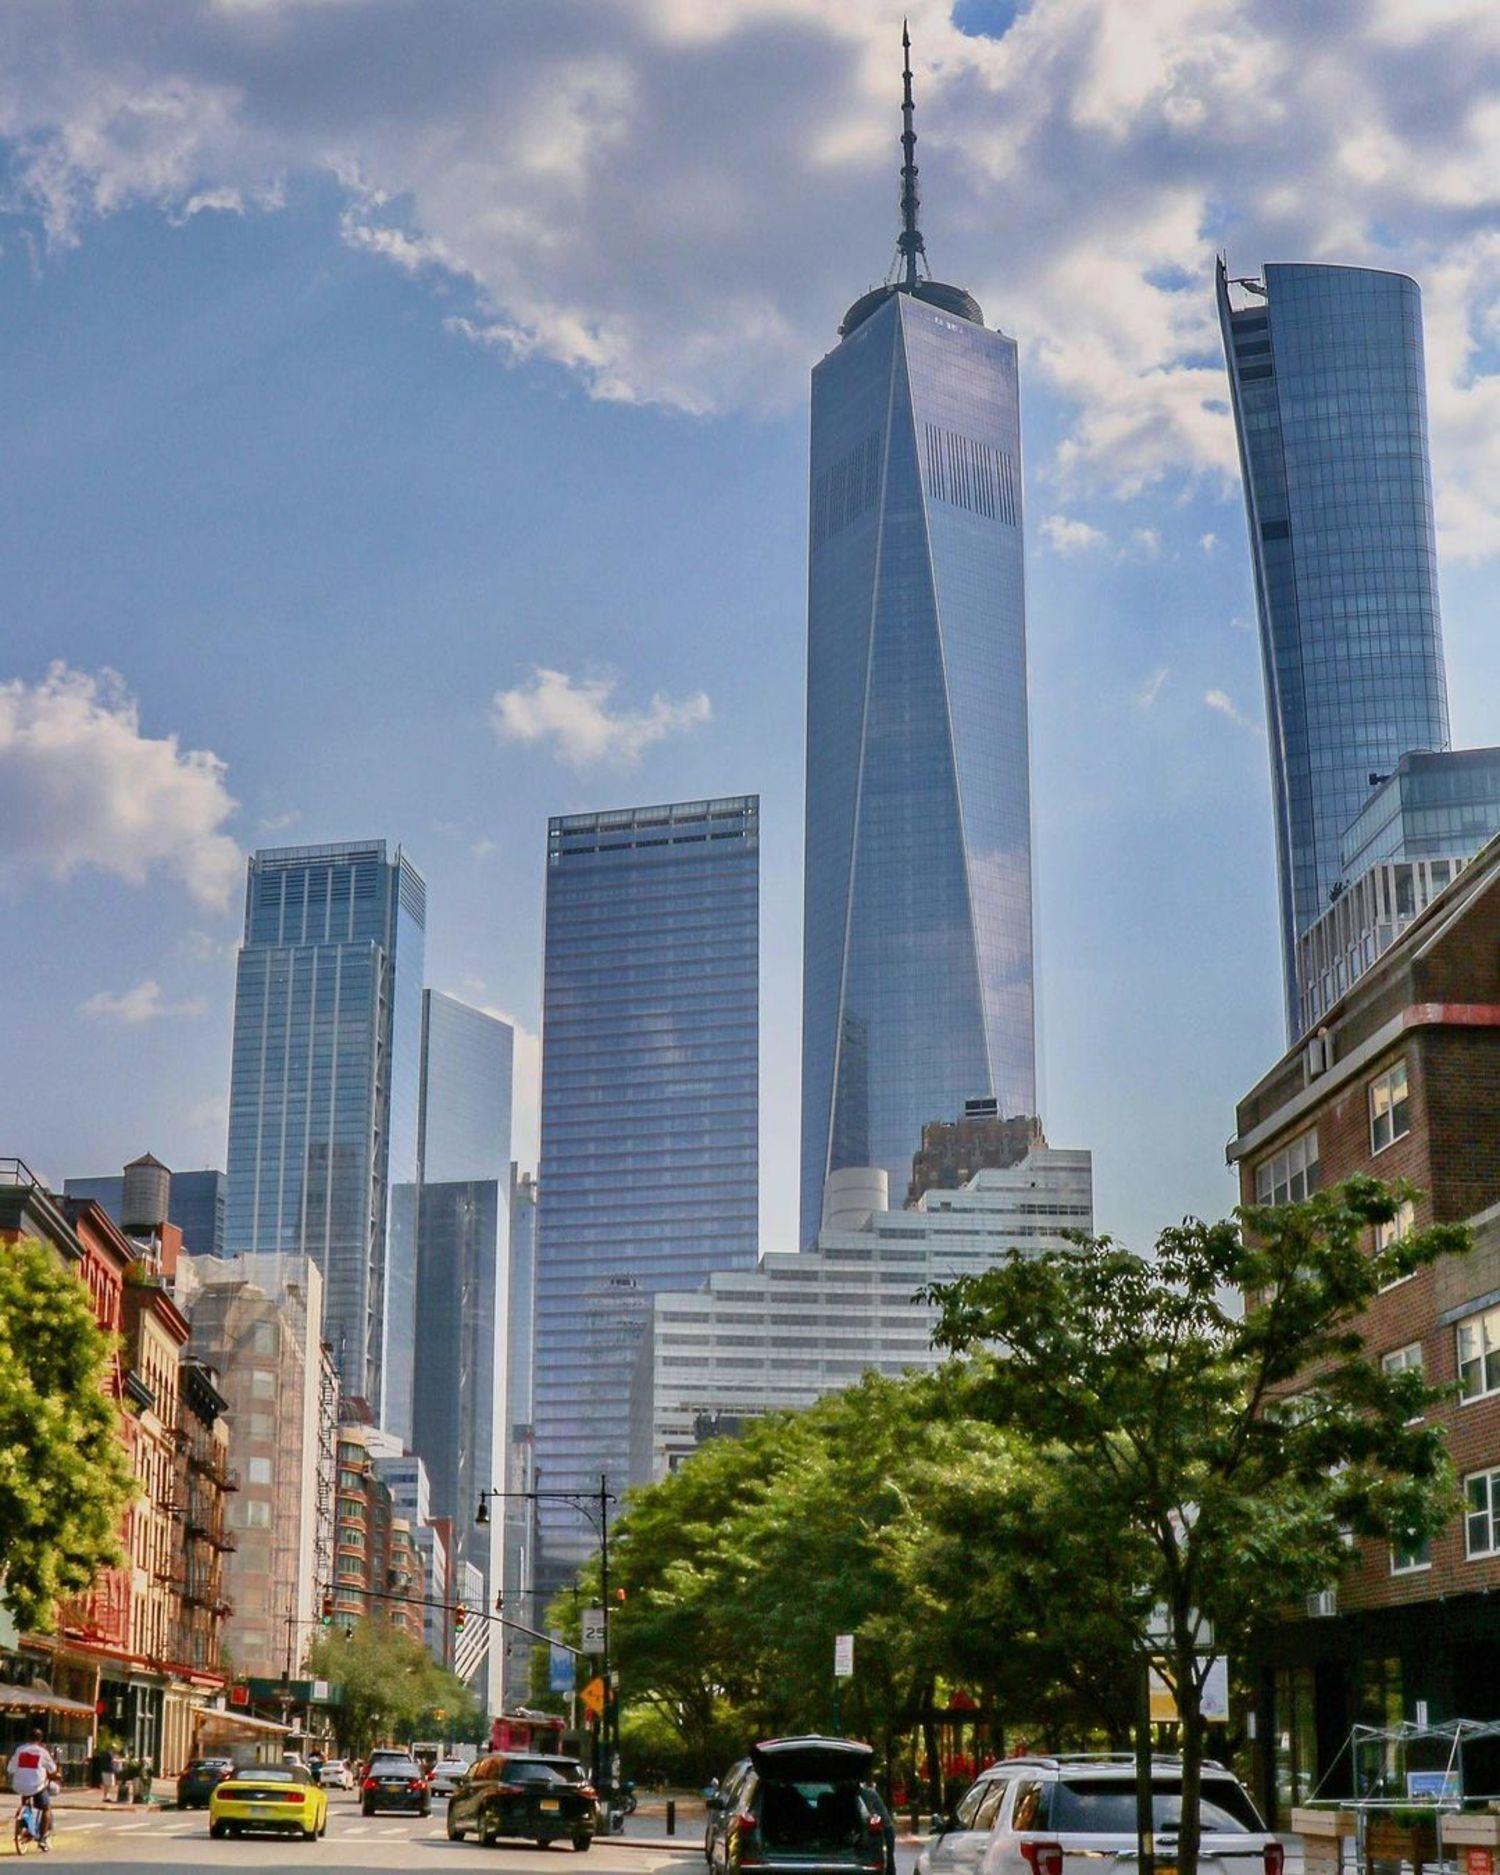 Lower Manhattan, New York